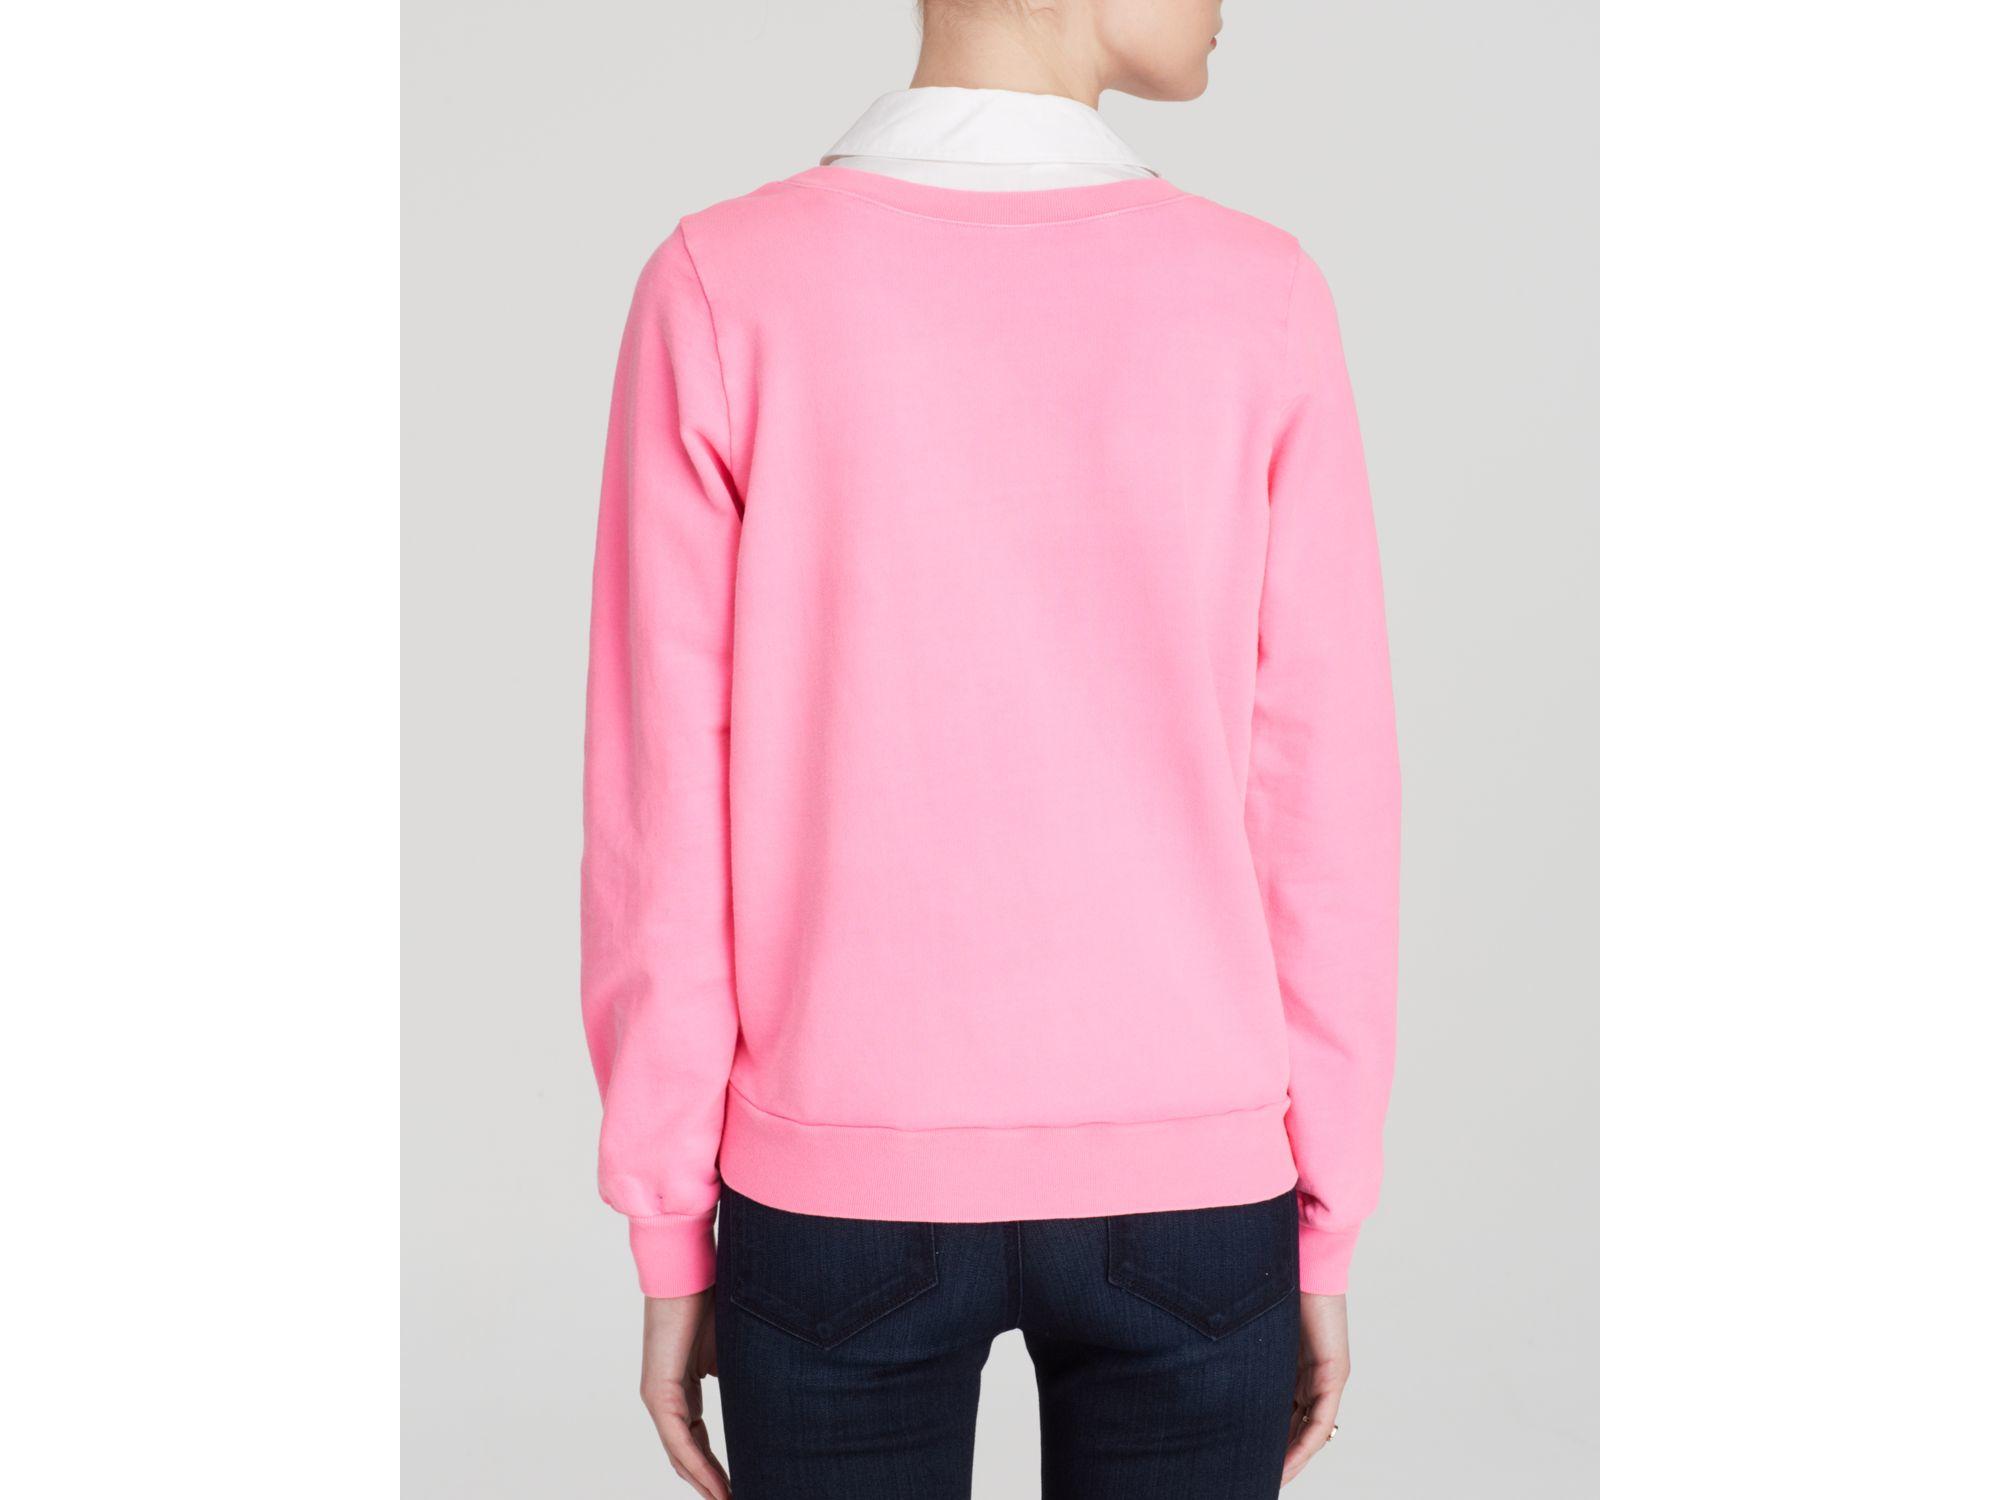 Clu too Sweatshirt - Collar in Pink | Lyst